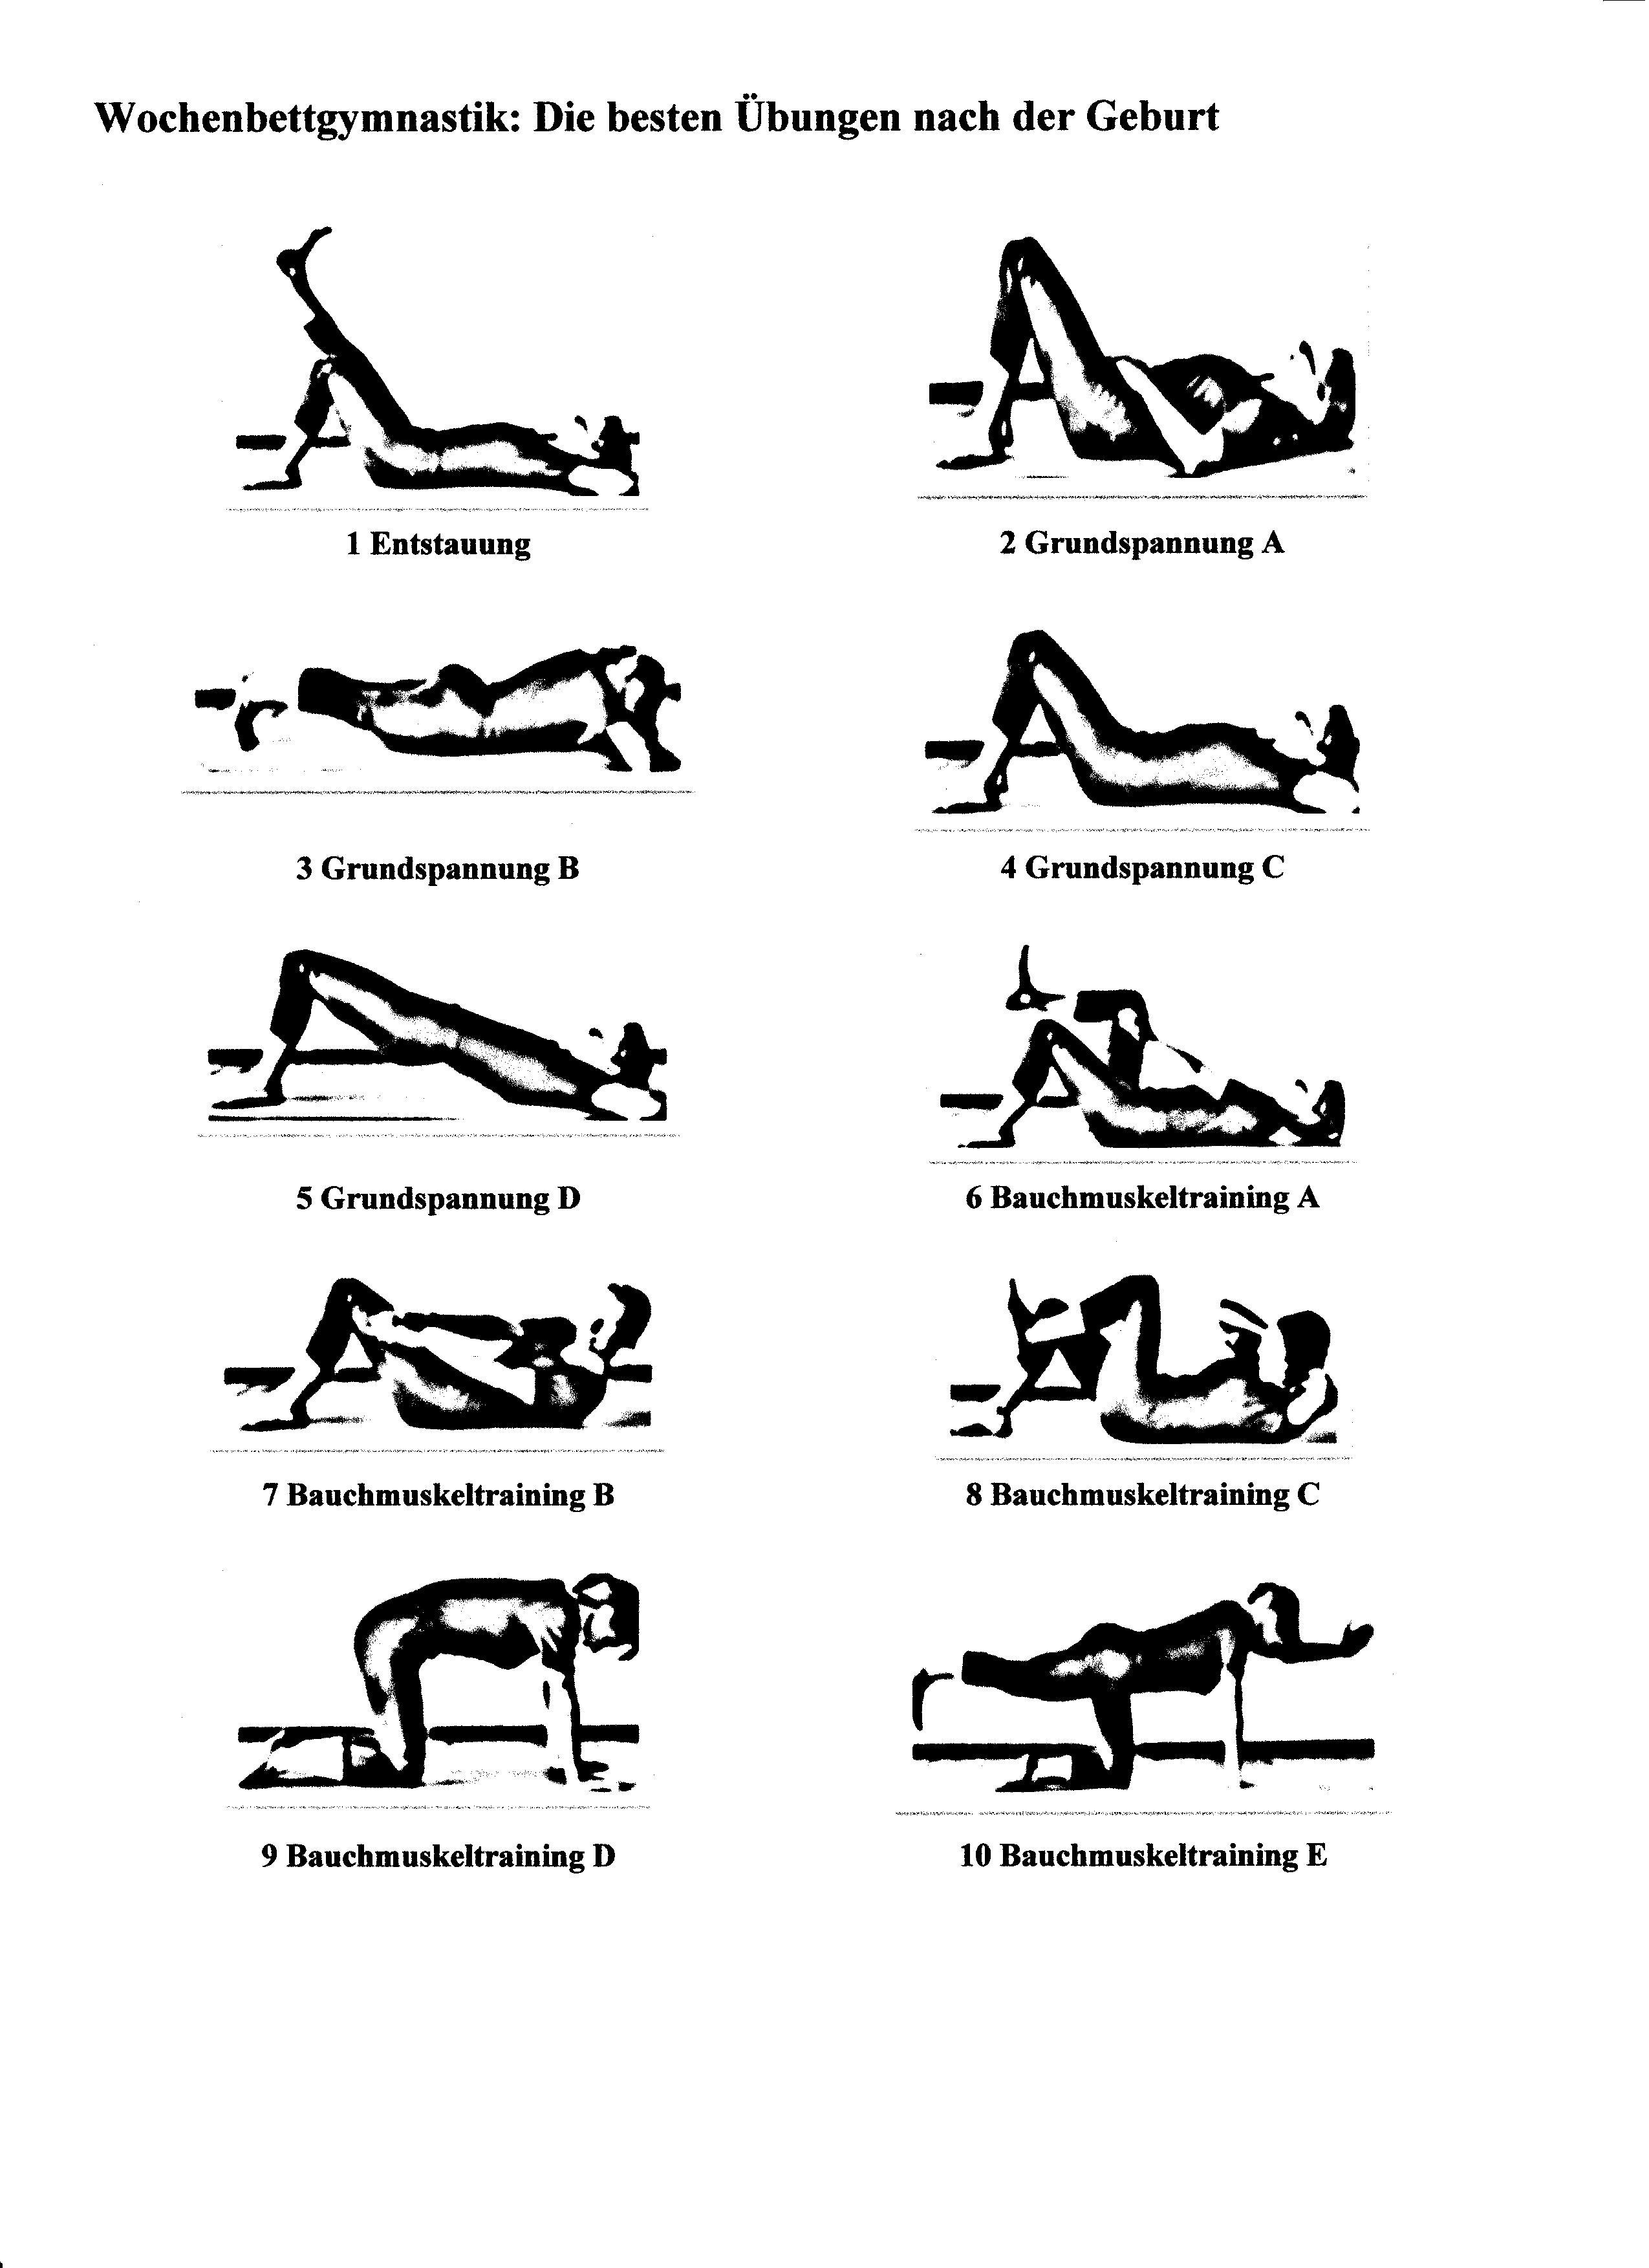 Wochenbettgymnastik Übung 1-10